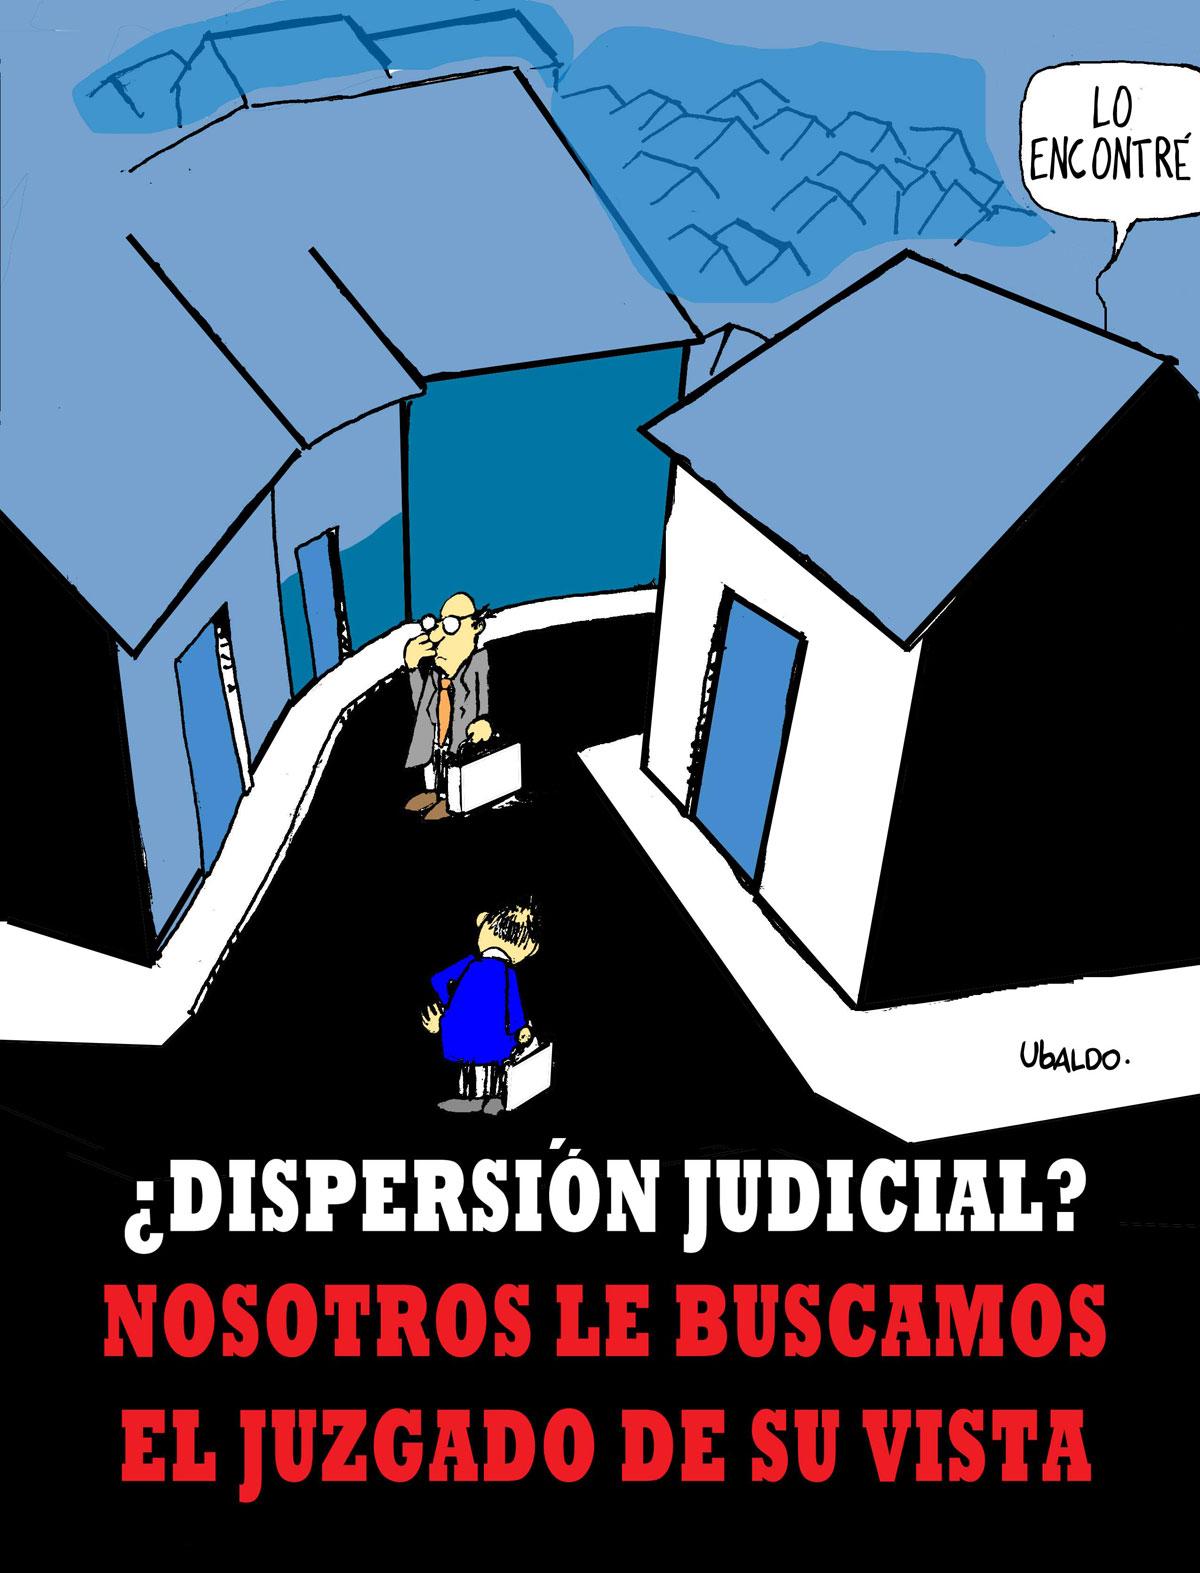 Ubaldo - dispersión judicial